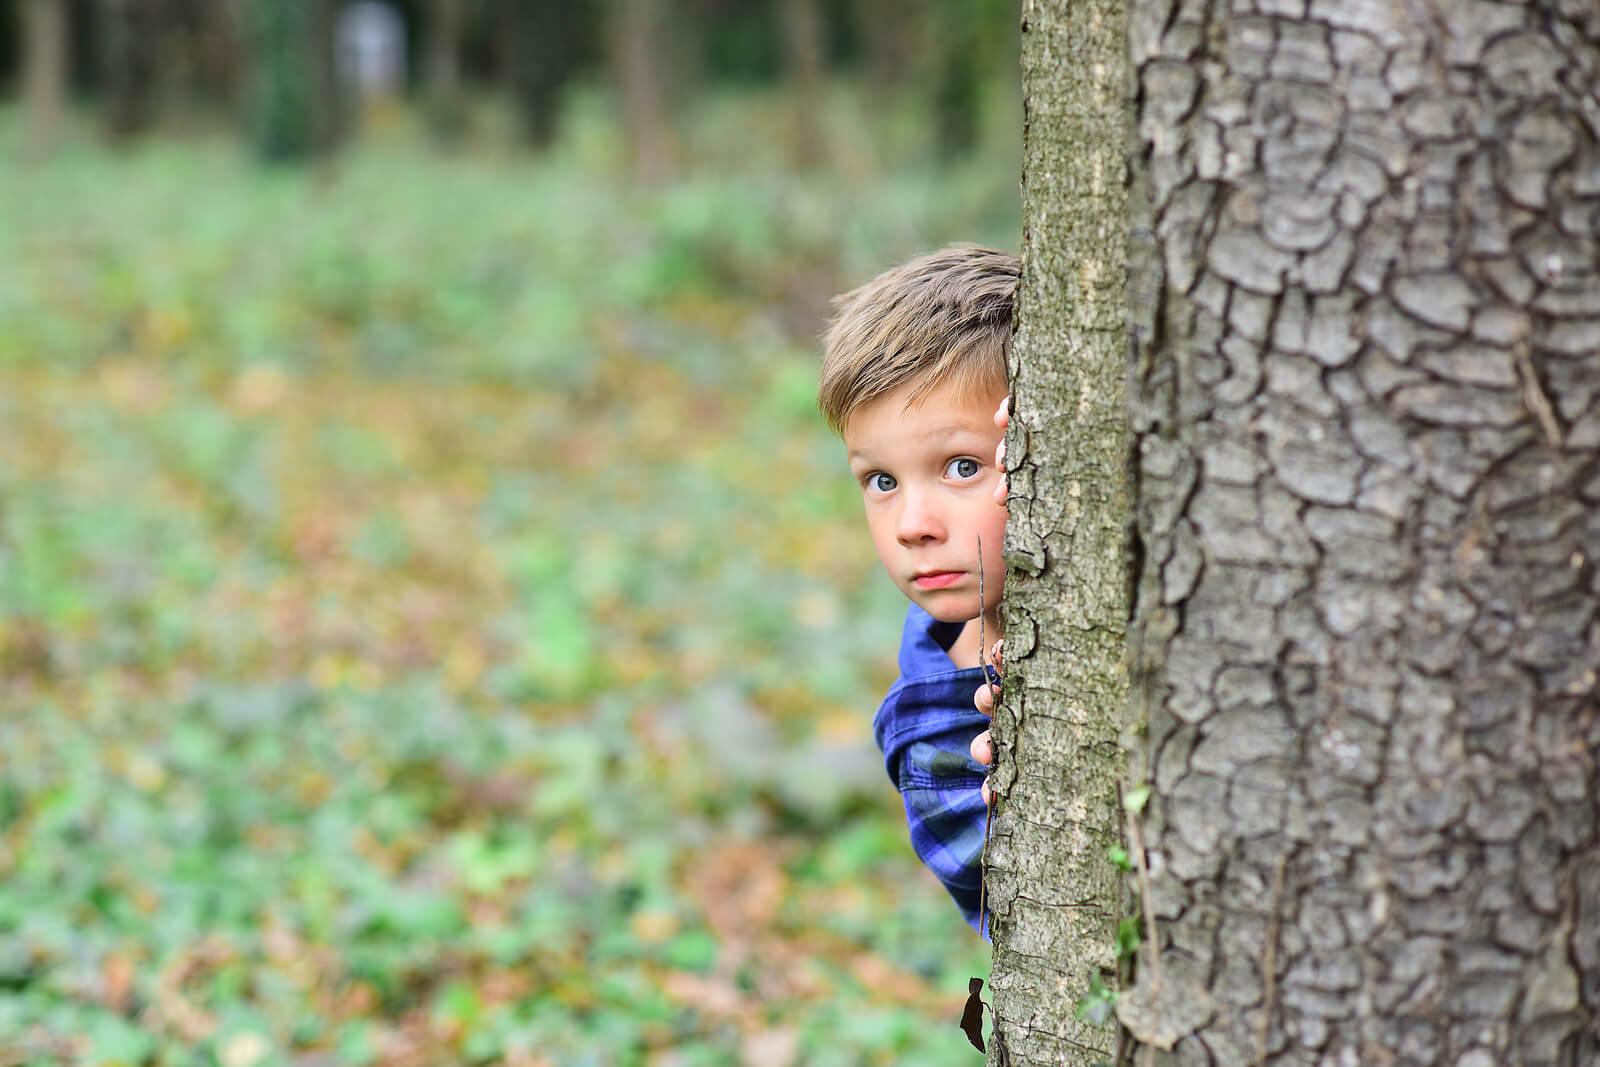 Niño escondido detrás de un árbol debido a sus miedos evolutivos.